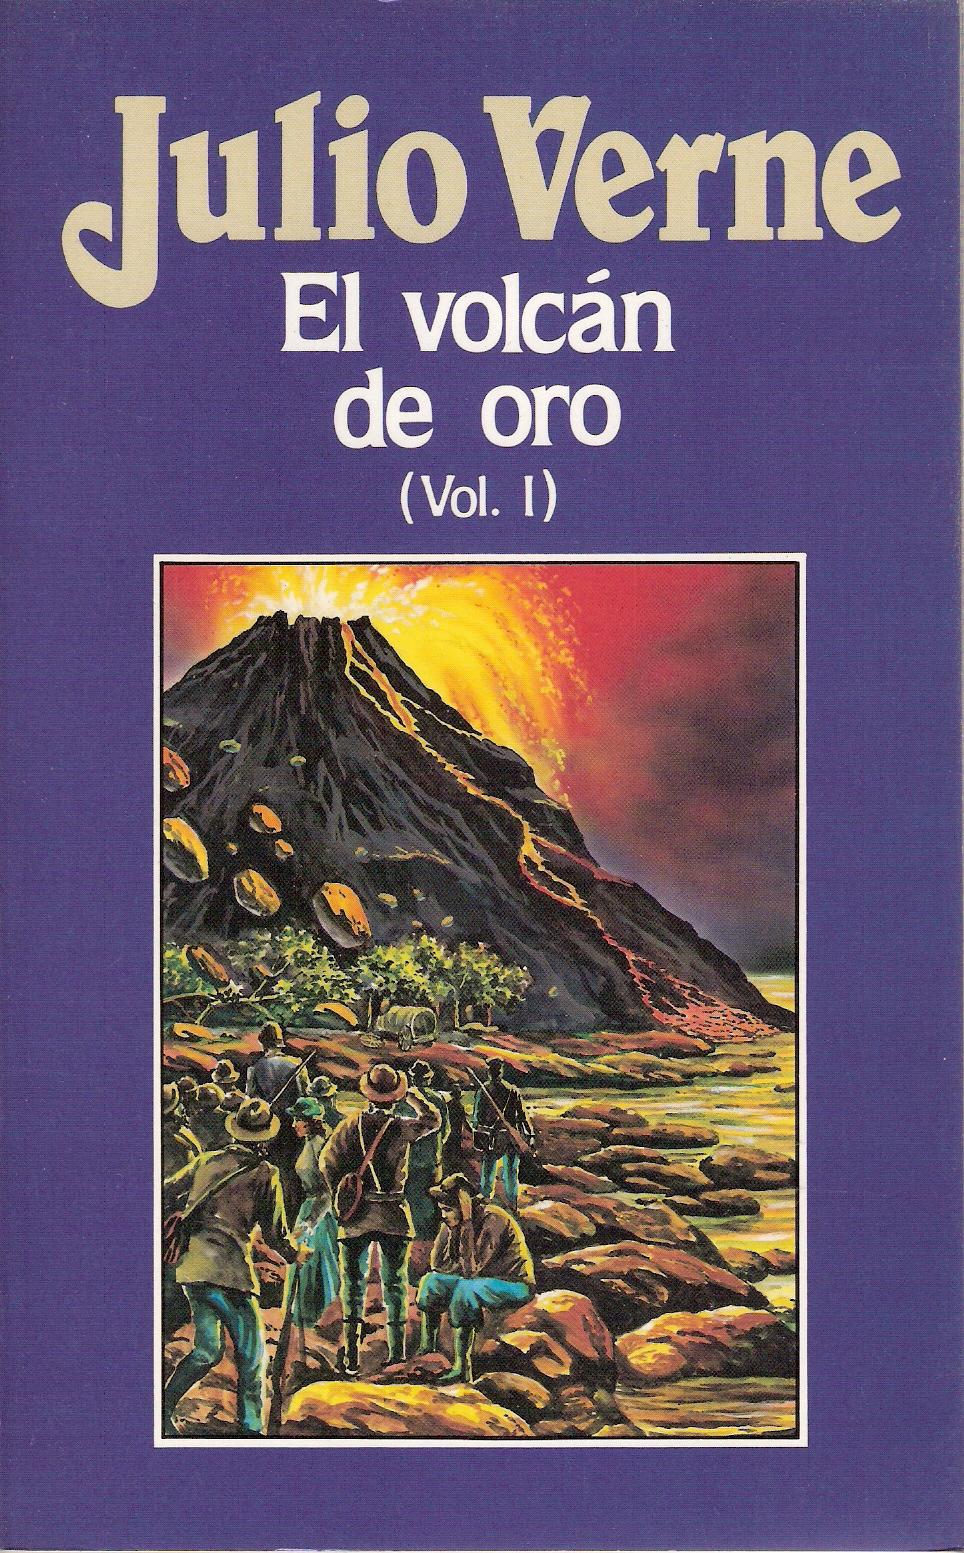 El volcán de oro I